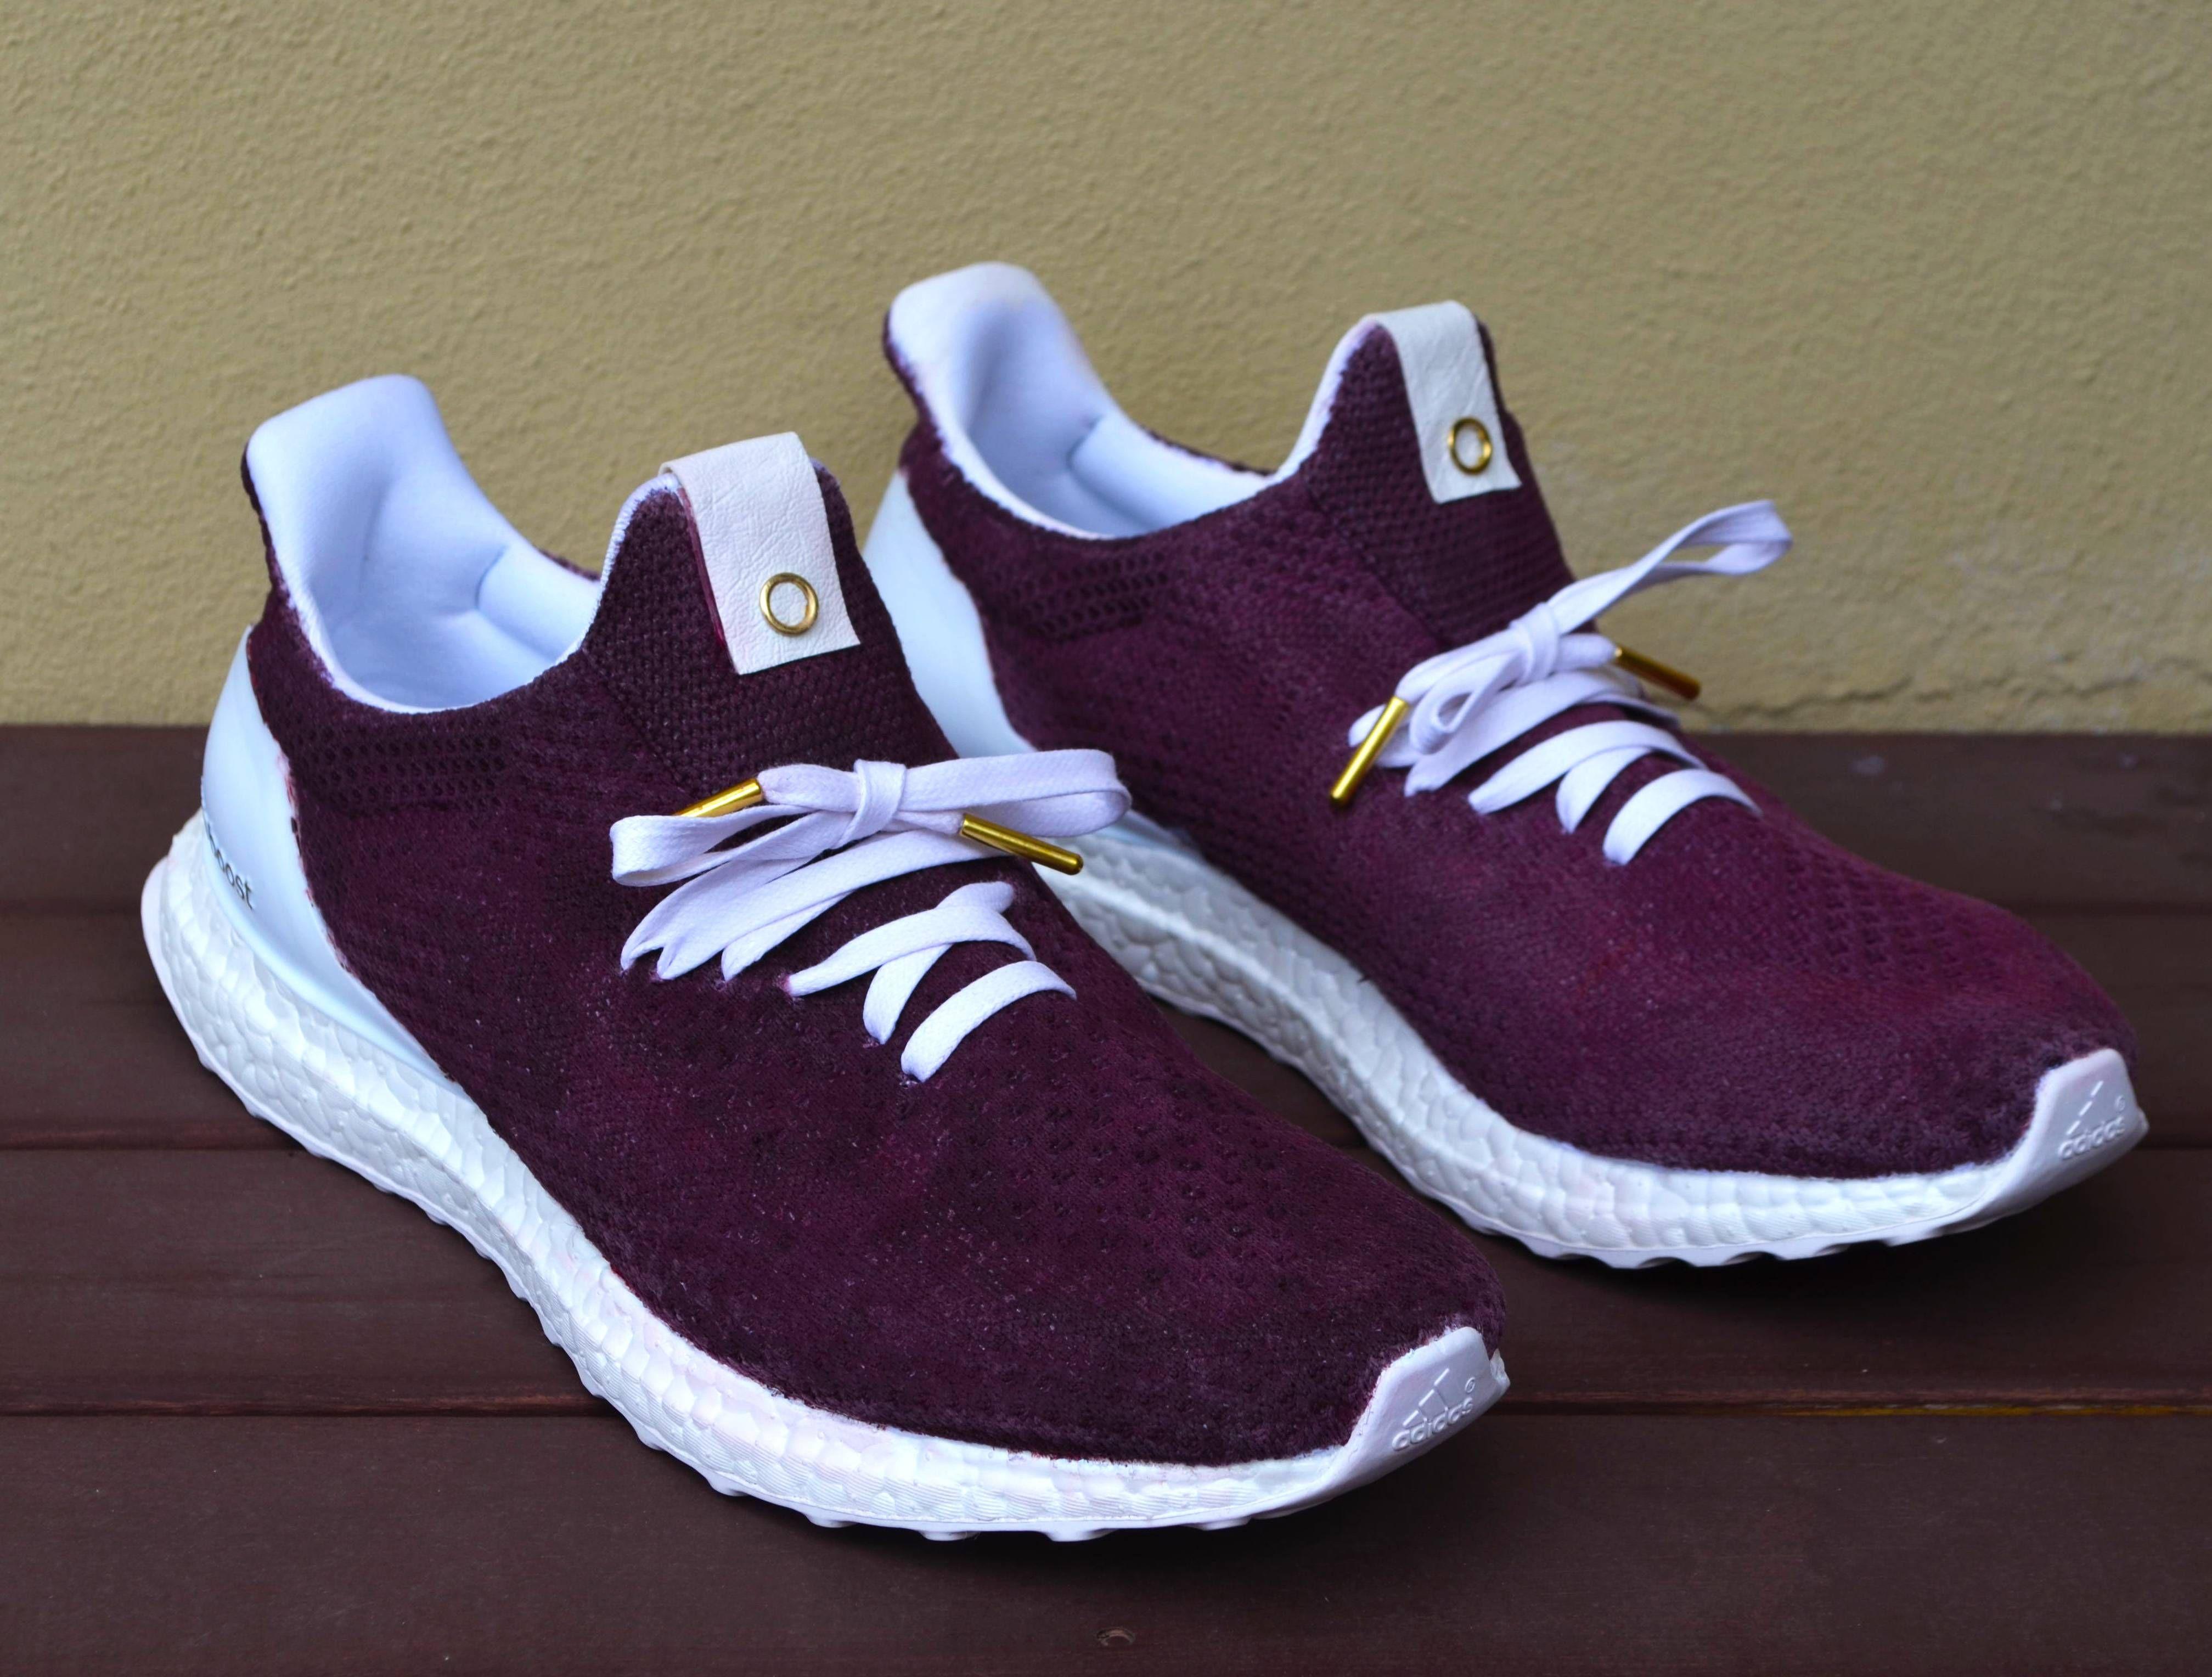 Side Project : Custom Adidas Ultra Boost x Burgundy Uncaged